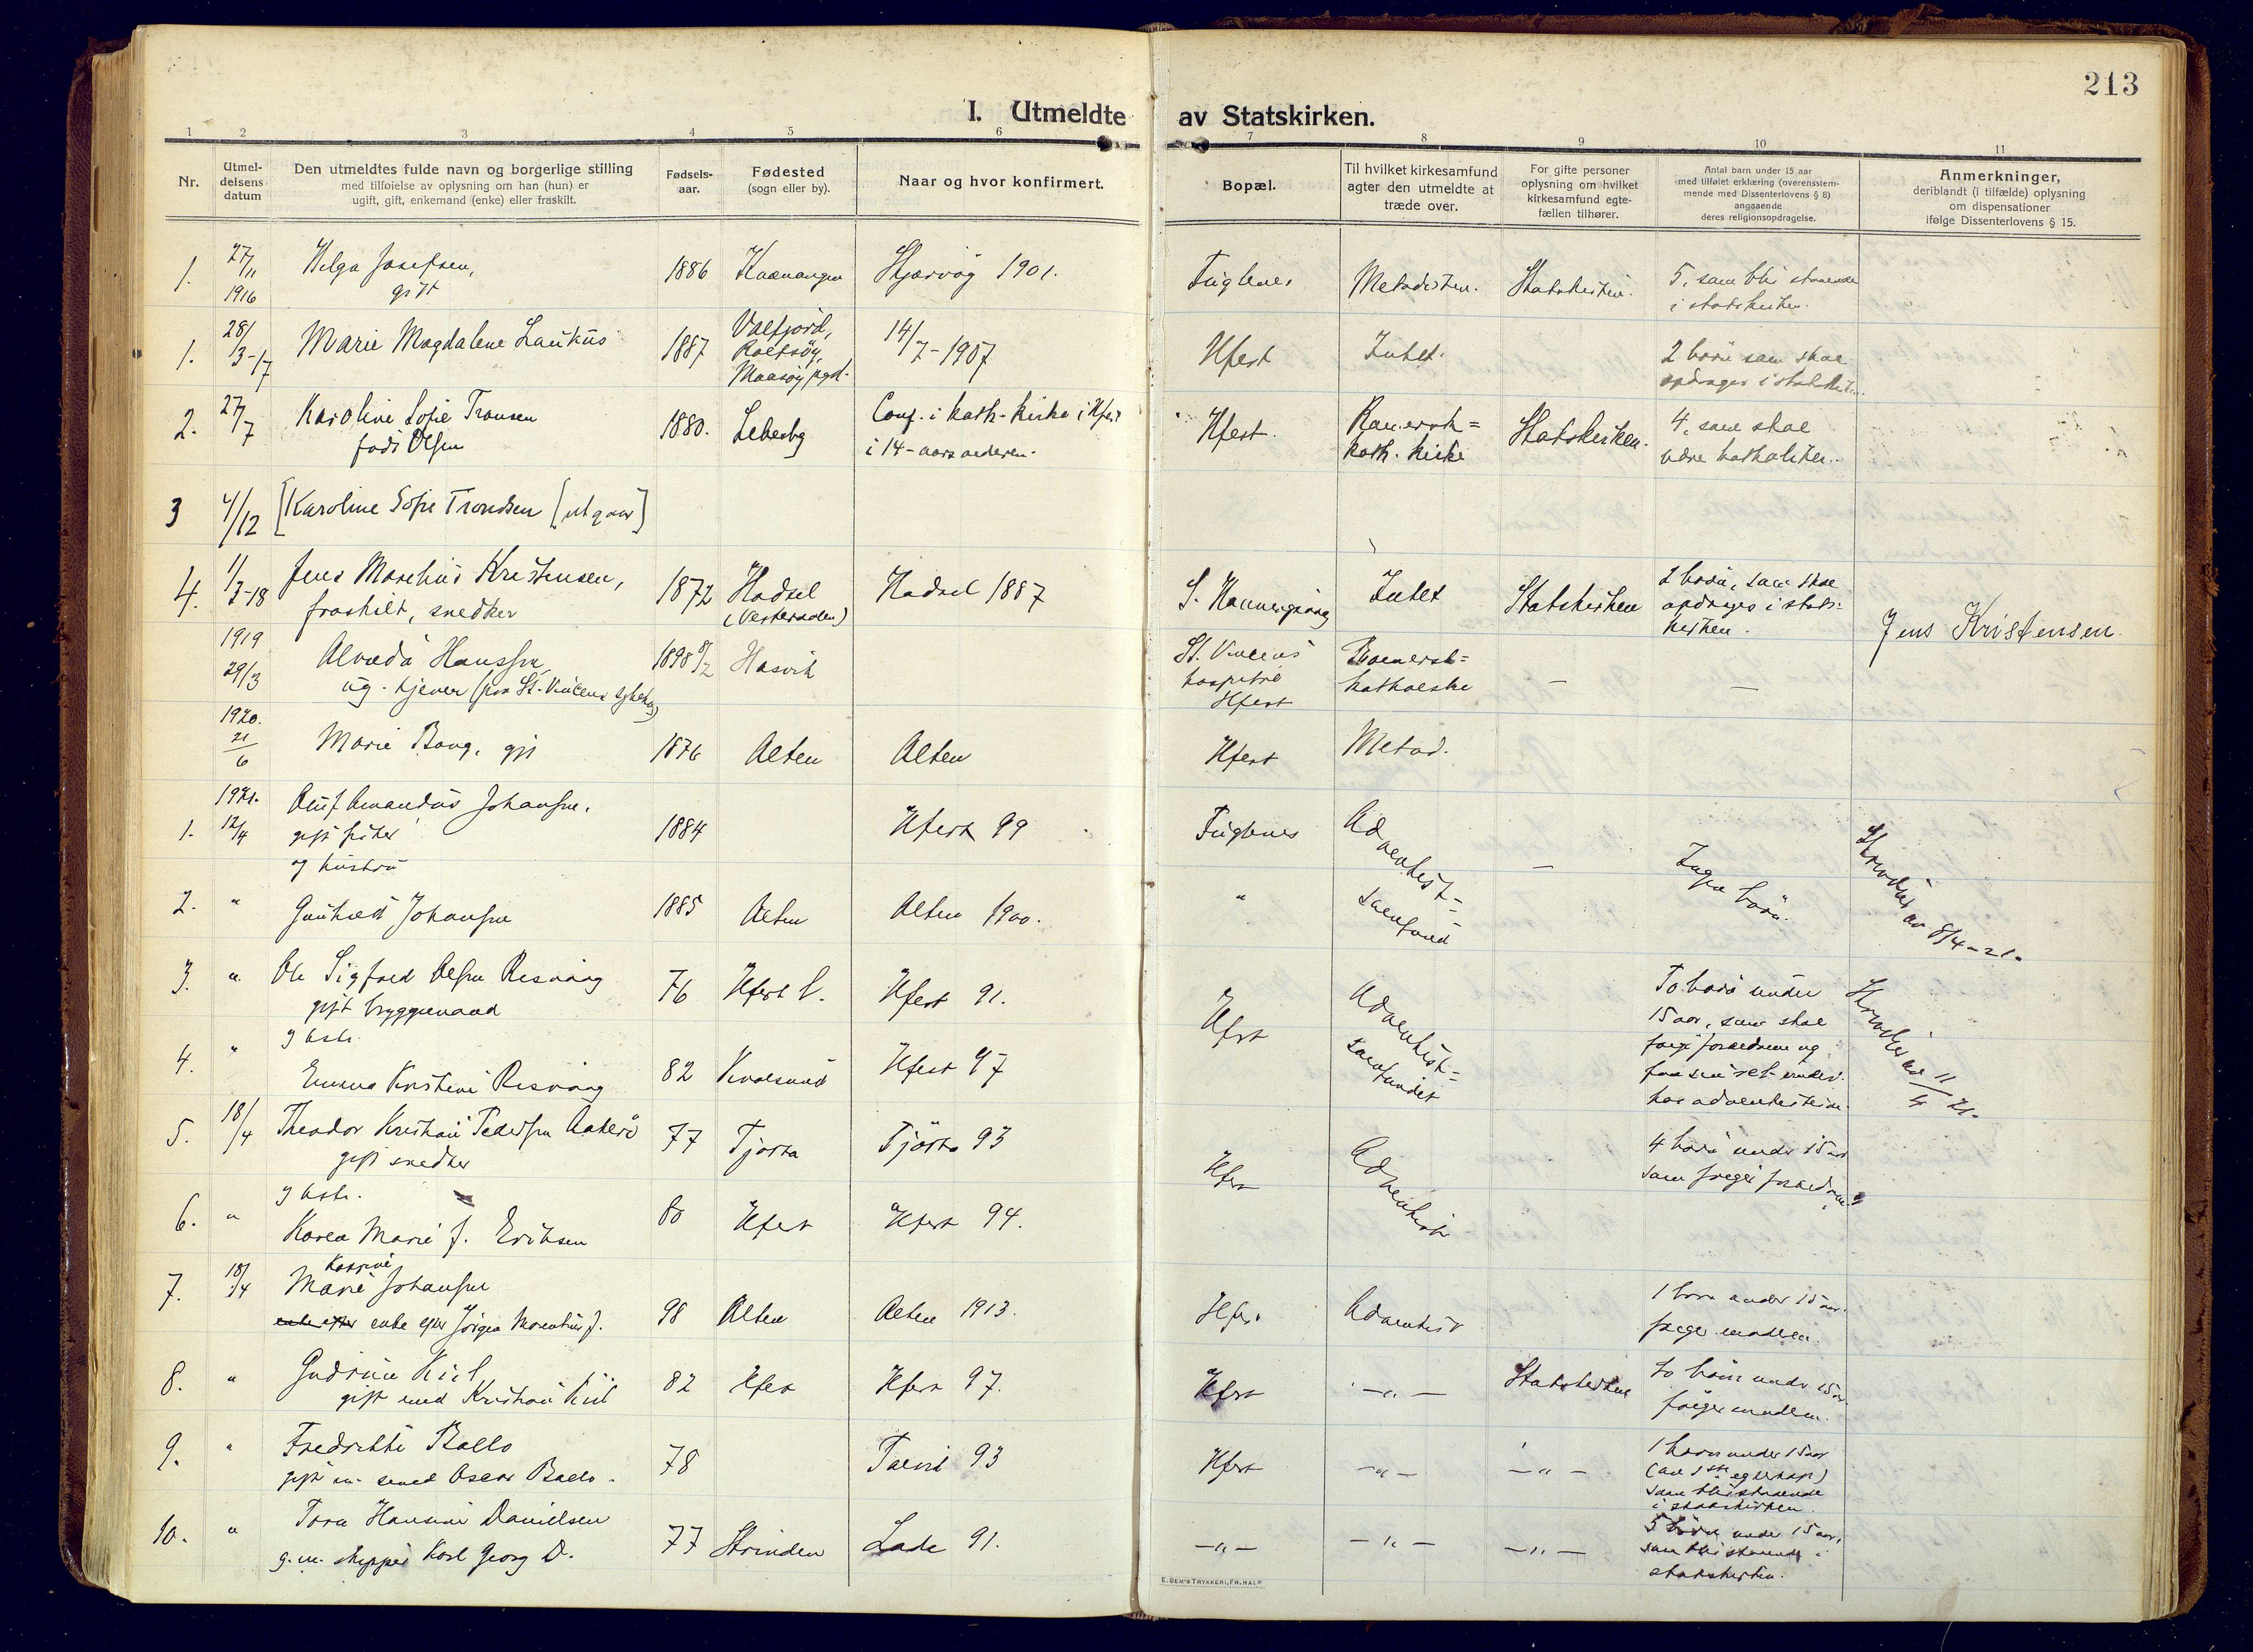 SATØ, Hammerfest sokneprestembete, Ministerialbok nr. 15, 1916-1923, s. 213